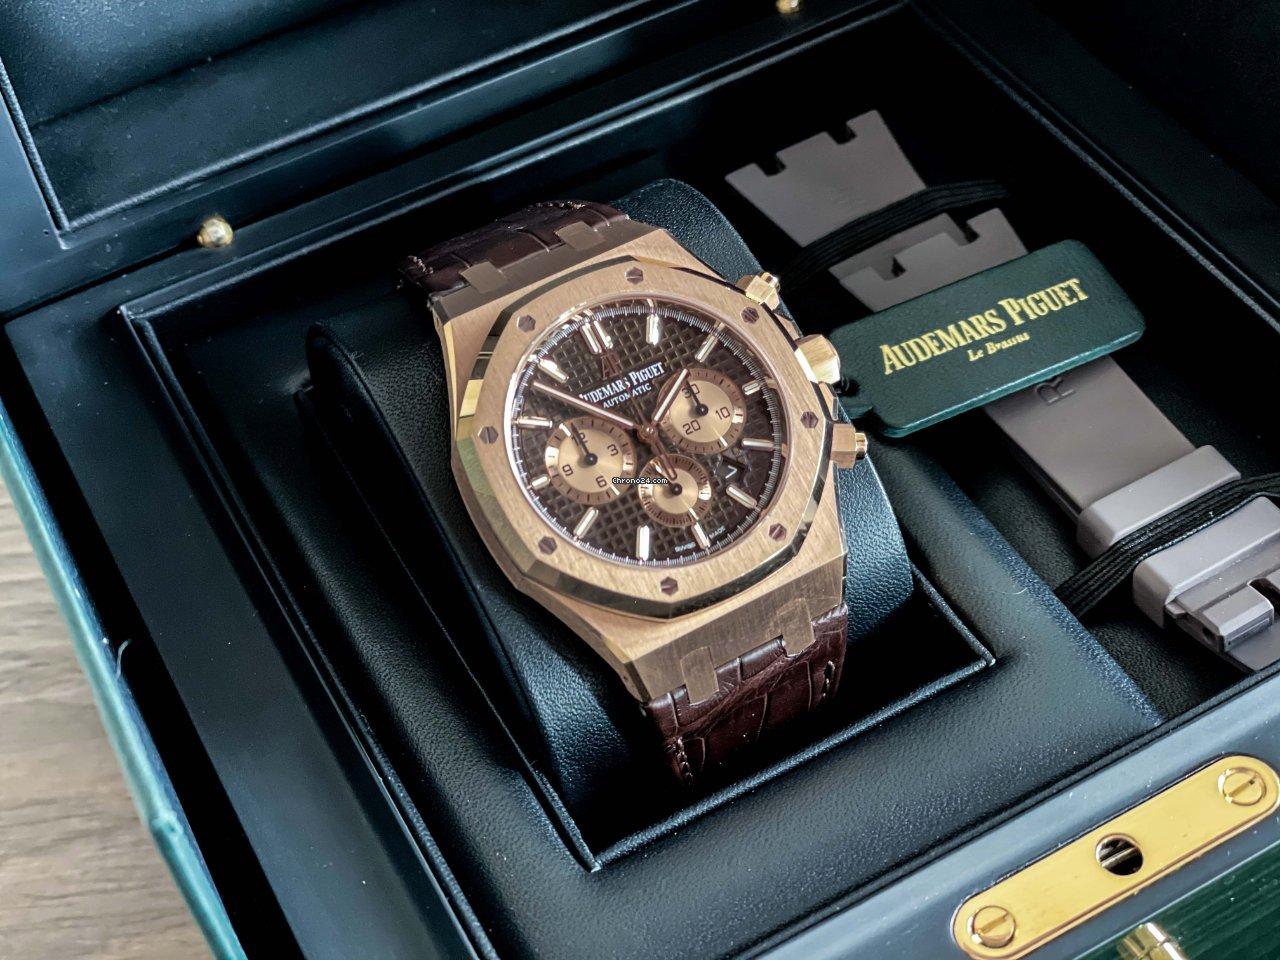 Audemars Piguet Royal Oak Chronograph 26331OR.OO.D821CR.01 2019 tweedehands